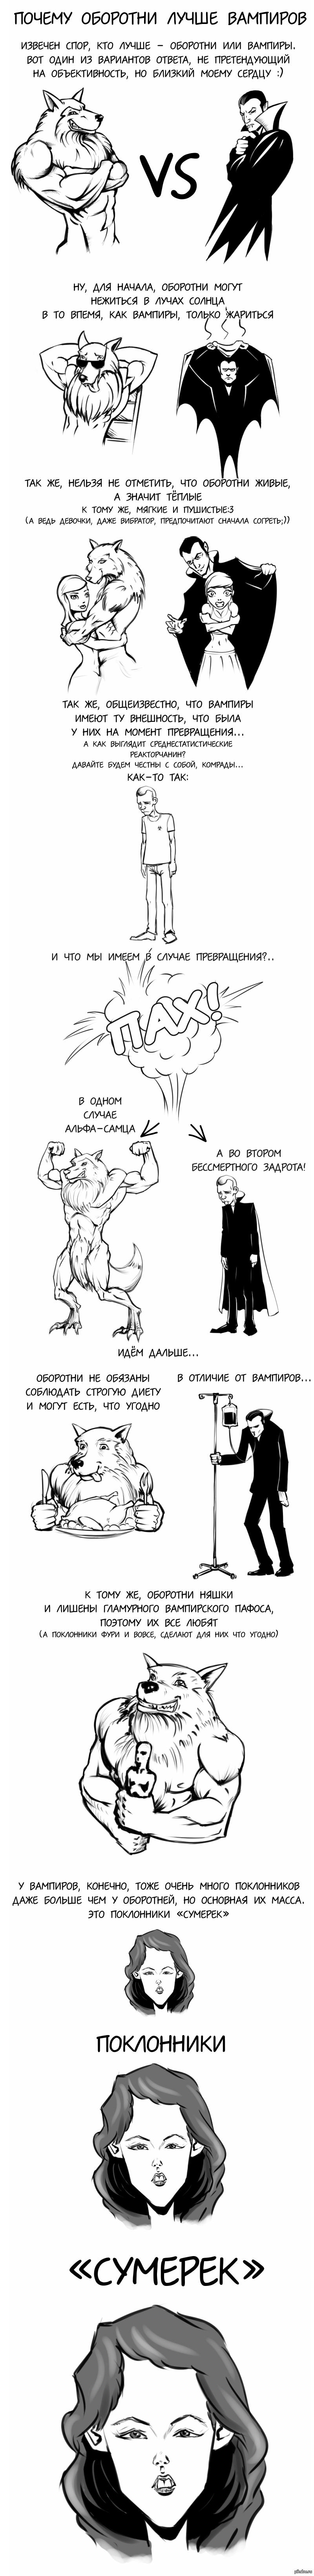 Секс у вампиров и обратний